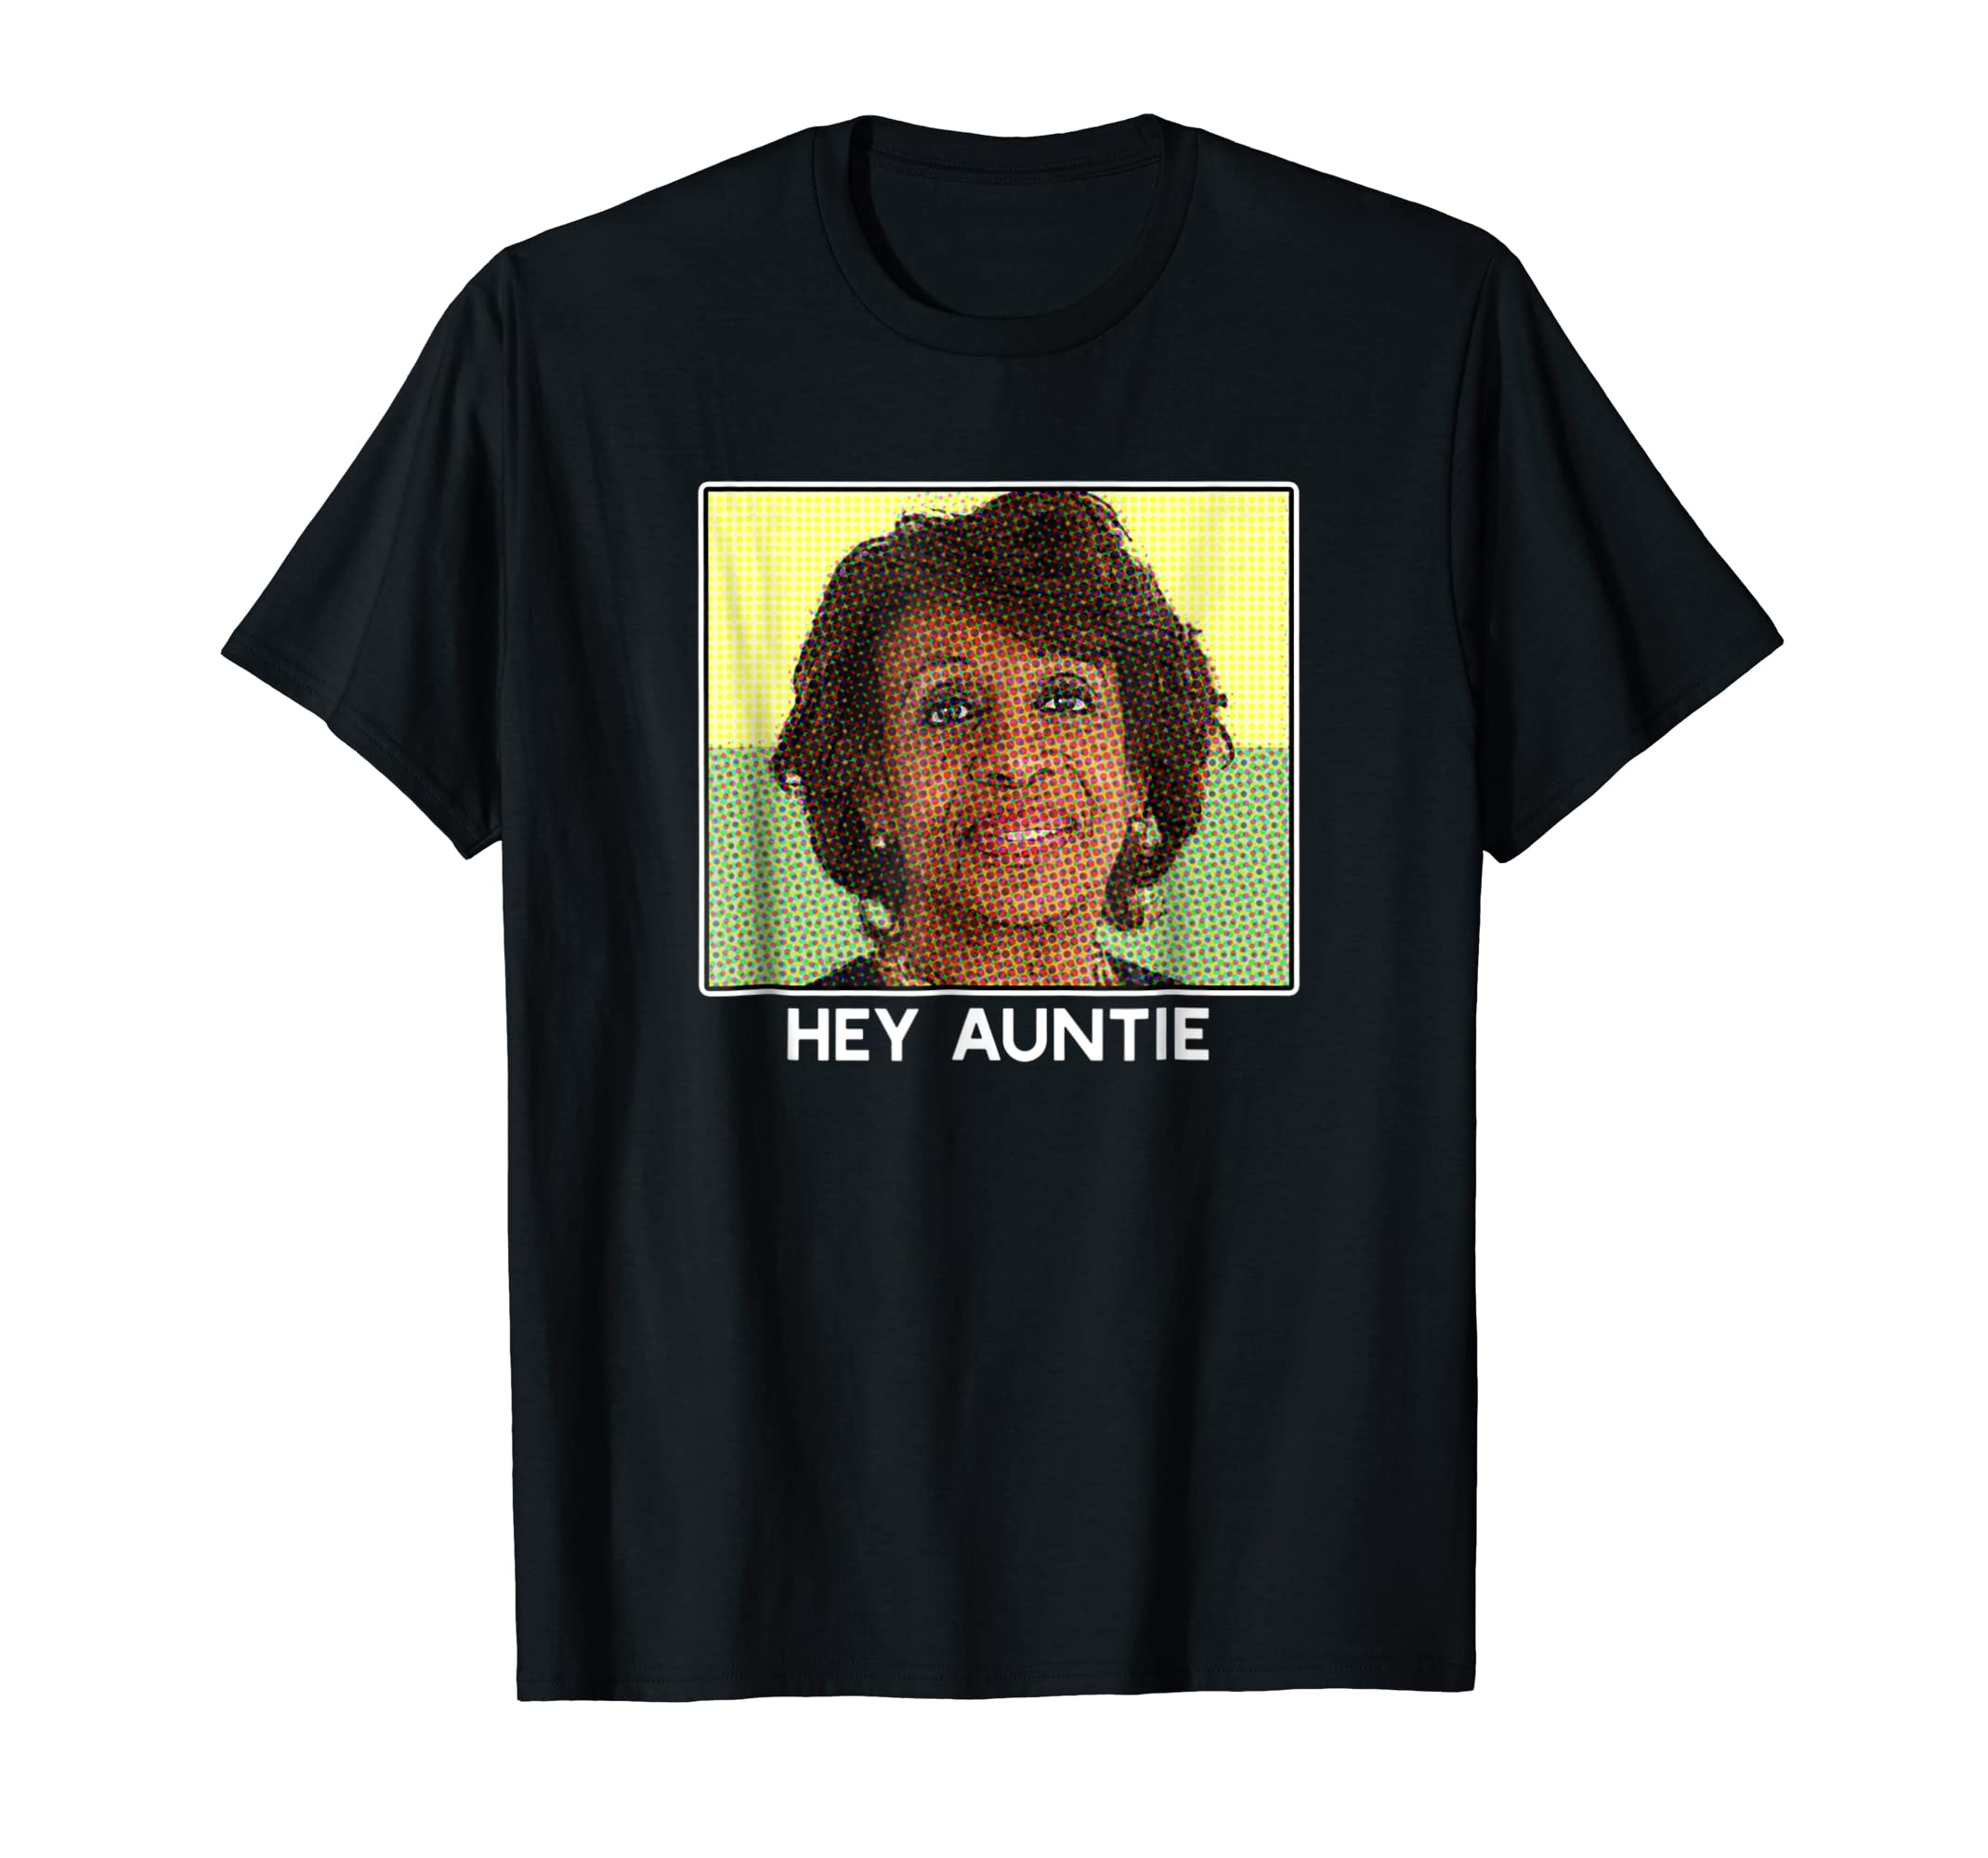 Amazoncom Hey Auntie Maxine Waters Funny Politics T Shirt Gift Meme